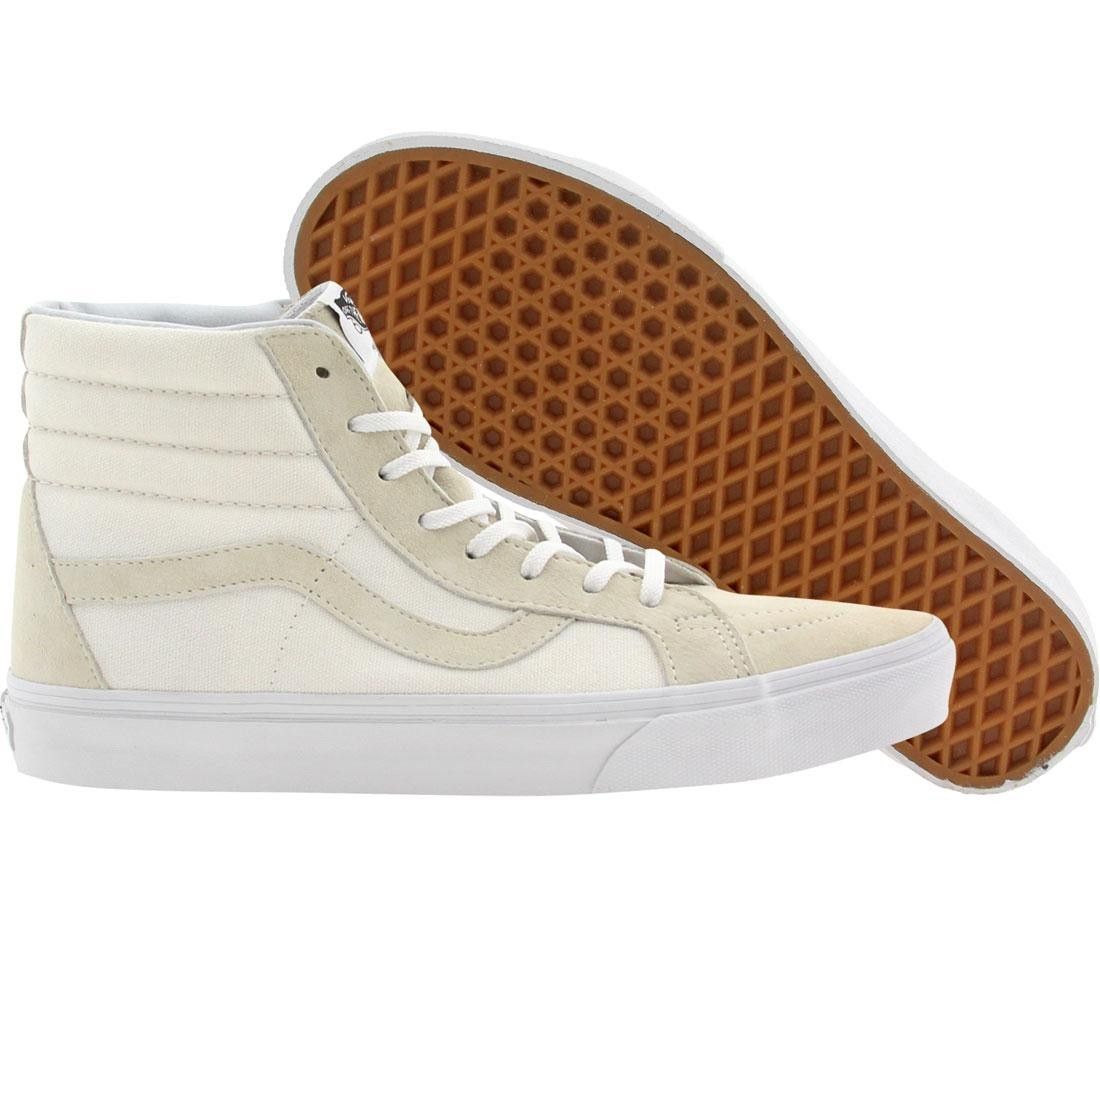 Vans Men Sk8-Hi Reissue - Vansguard (white   true white) f13aa6db7b